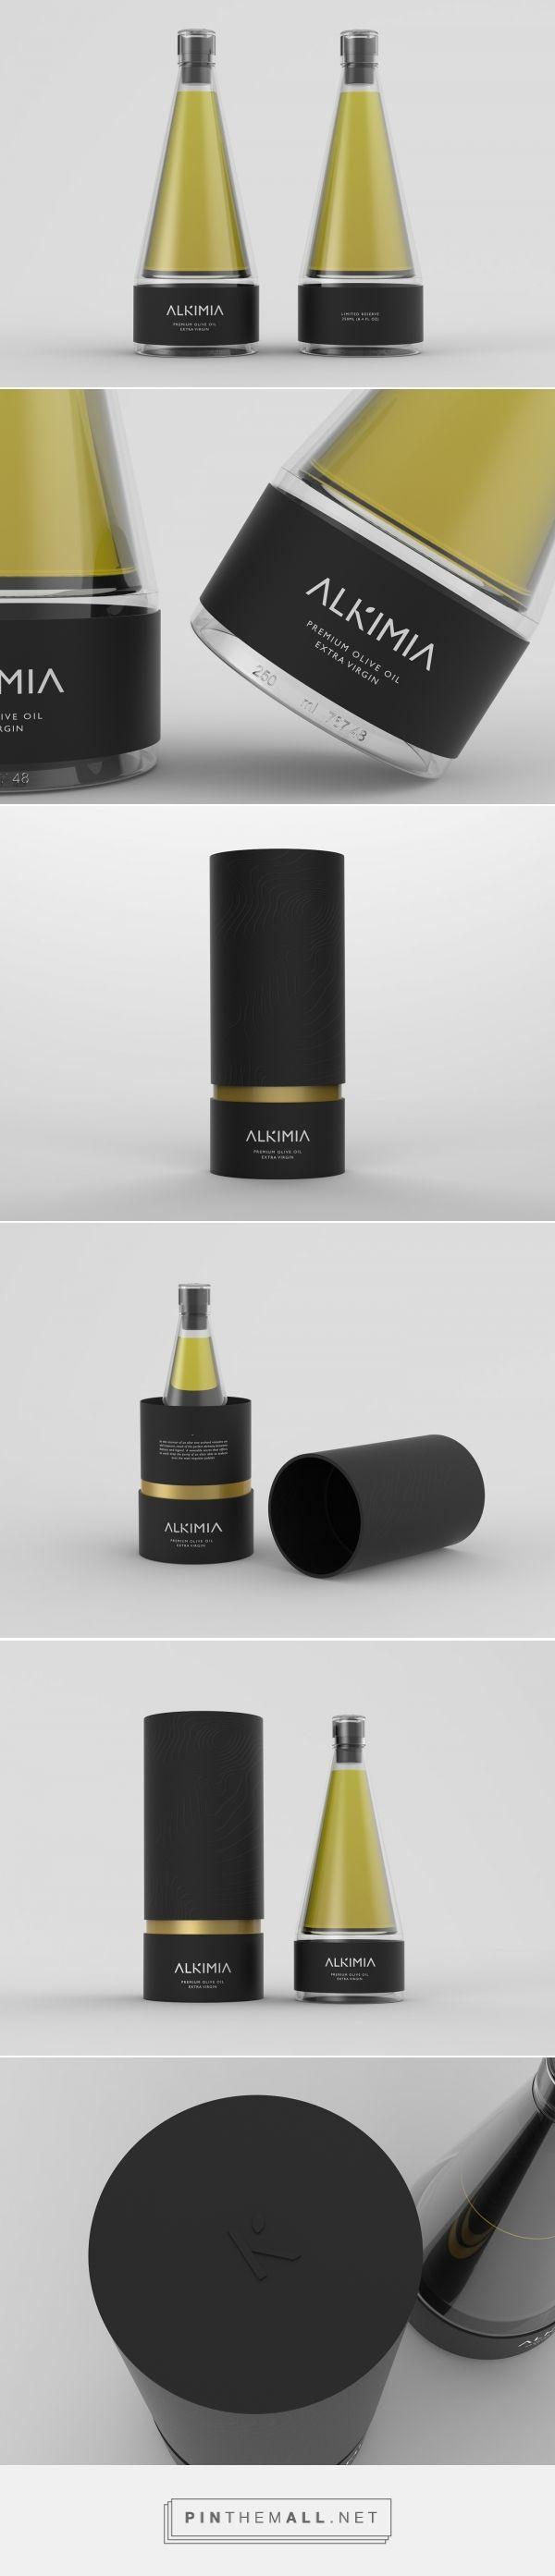 Alkimia Olive Oil Packaging on Behance | Fivestar Branding – Design and Branding Agency & Inspiration Gallery